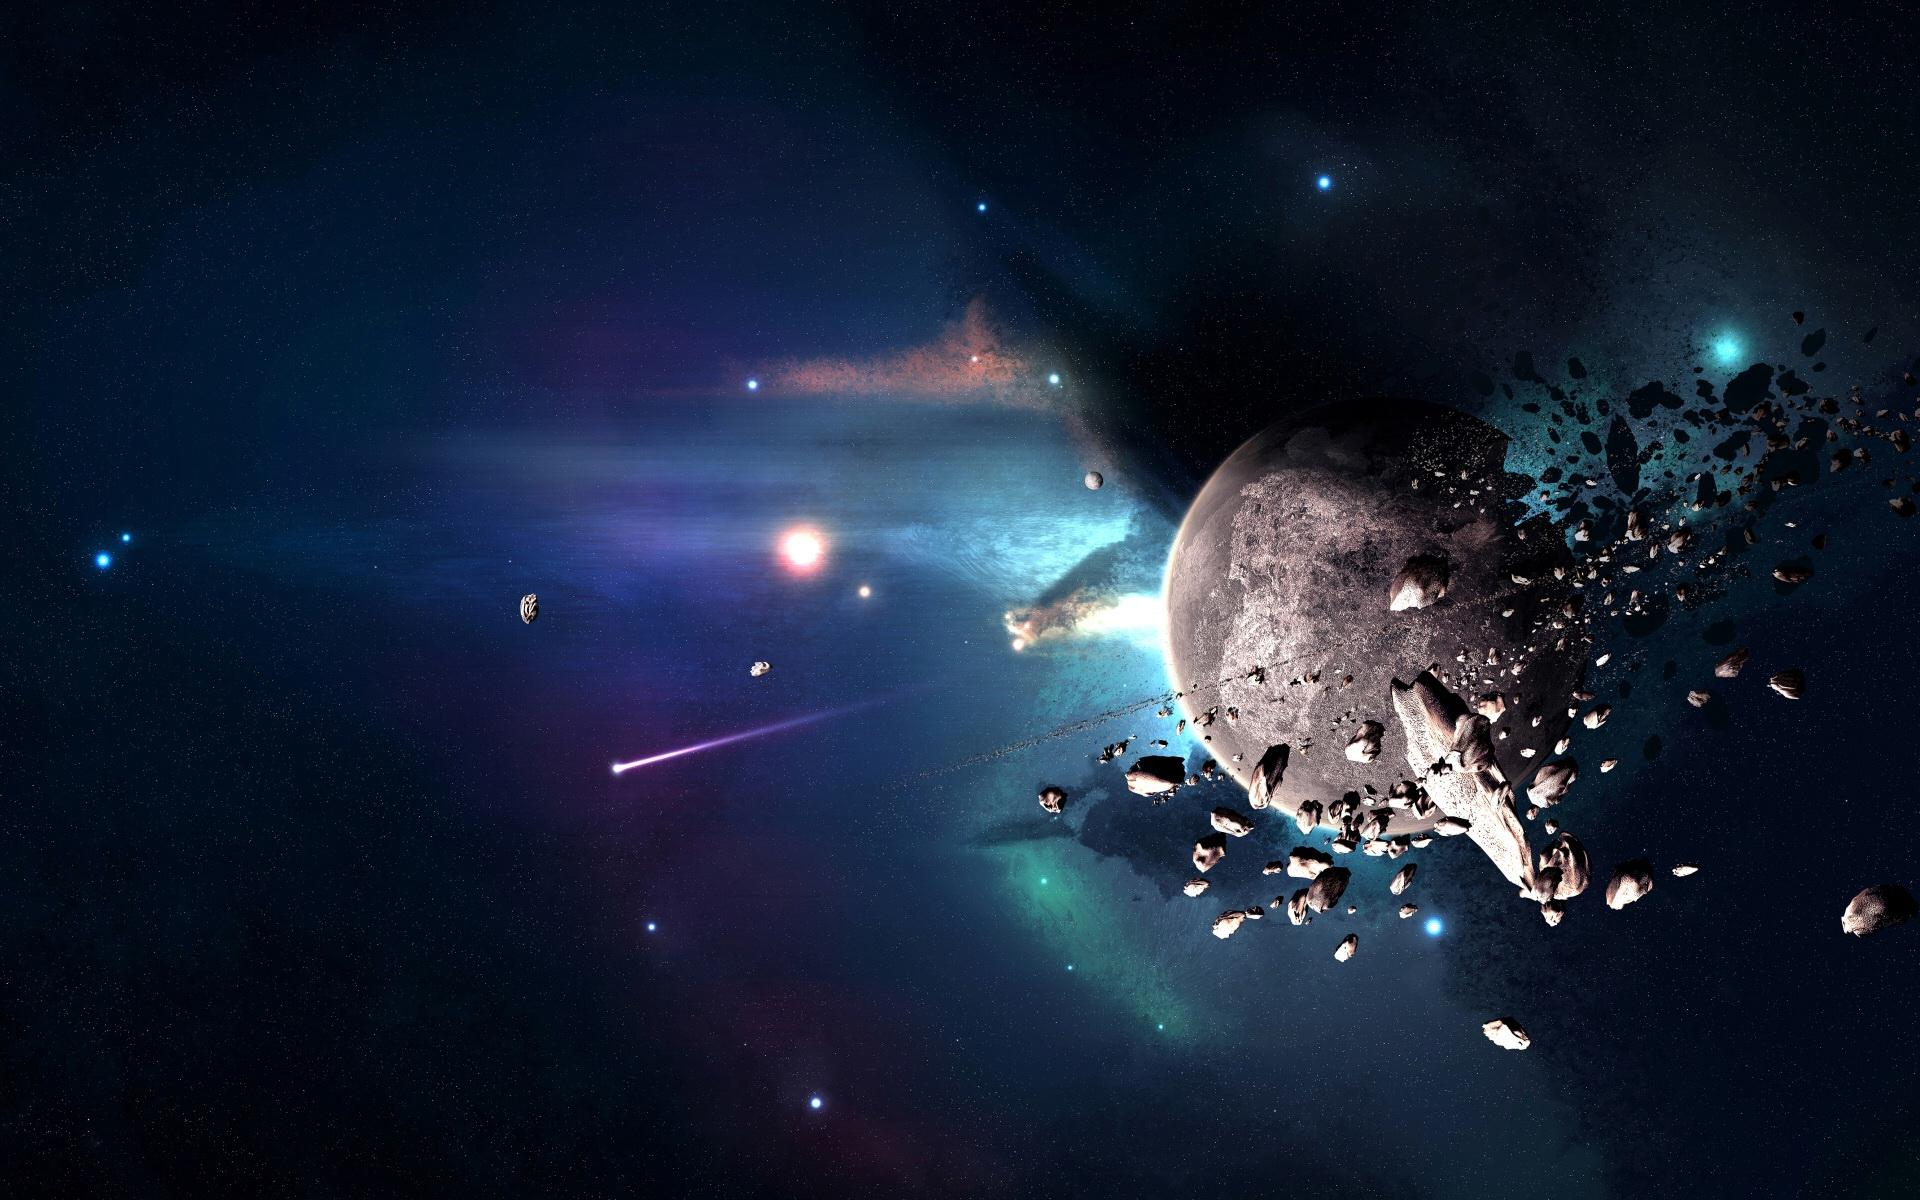 Картинки космос currently 6 43 10 1 2 3 4 5 6 7